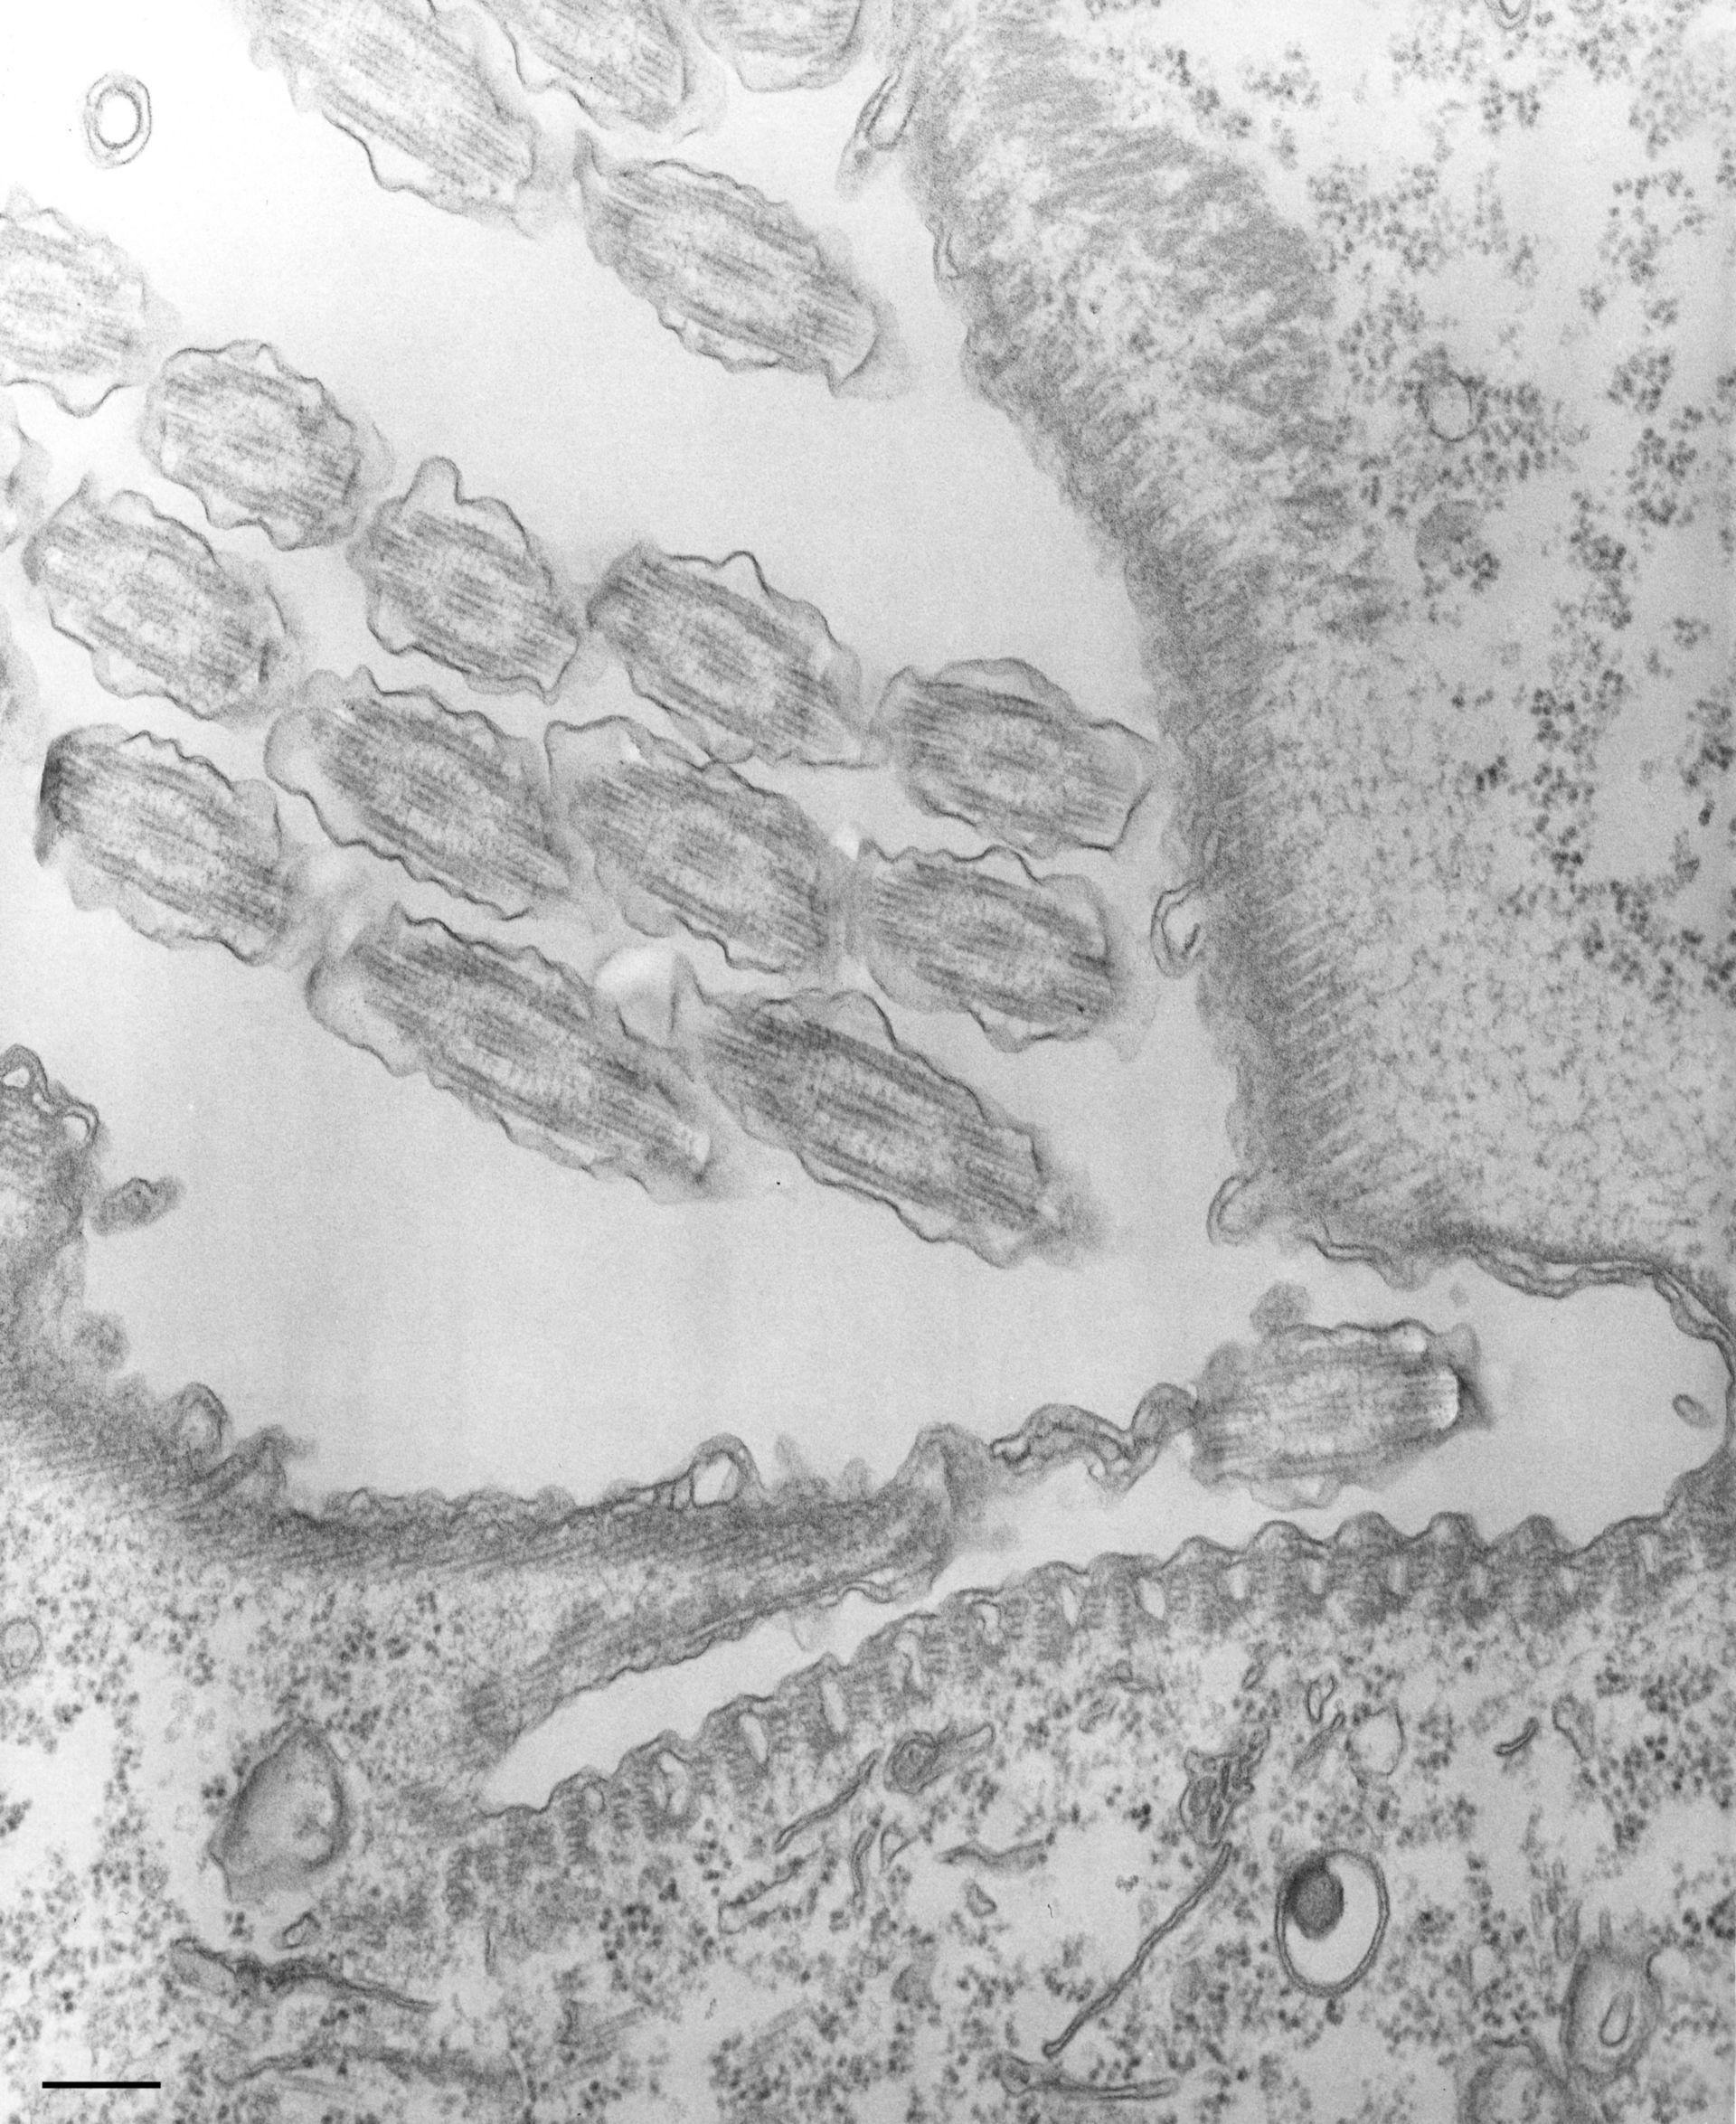 Tetrahymena pyriformis (apparato orale) - CIL:35483